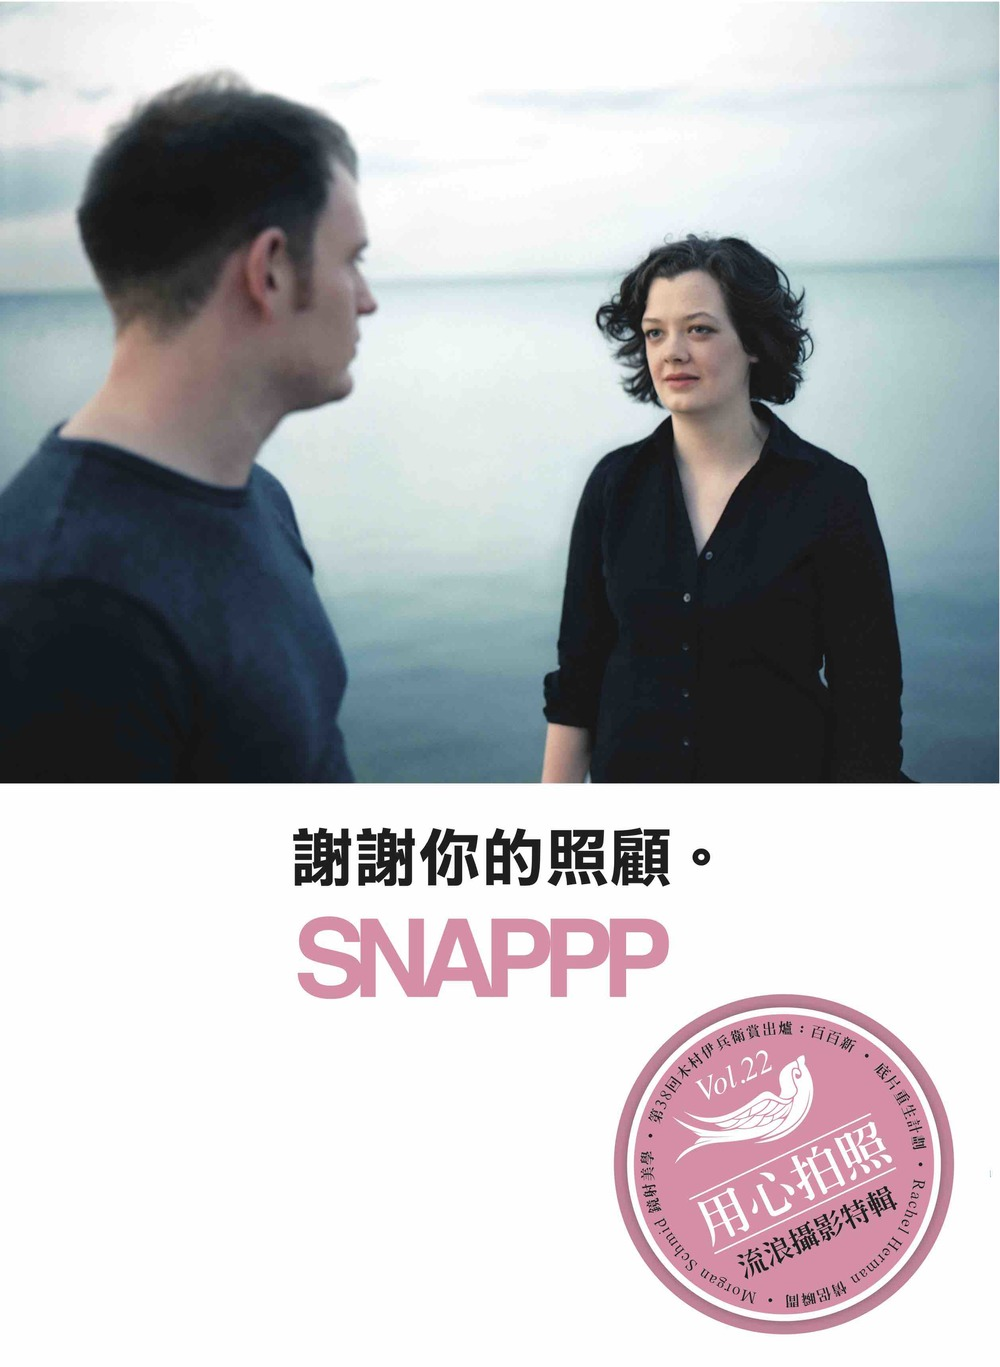 SNAPPP-NO22-ver1.jpg